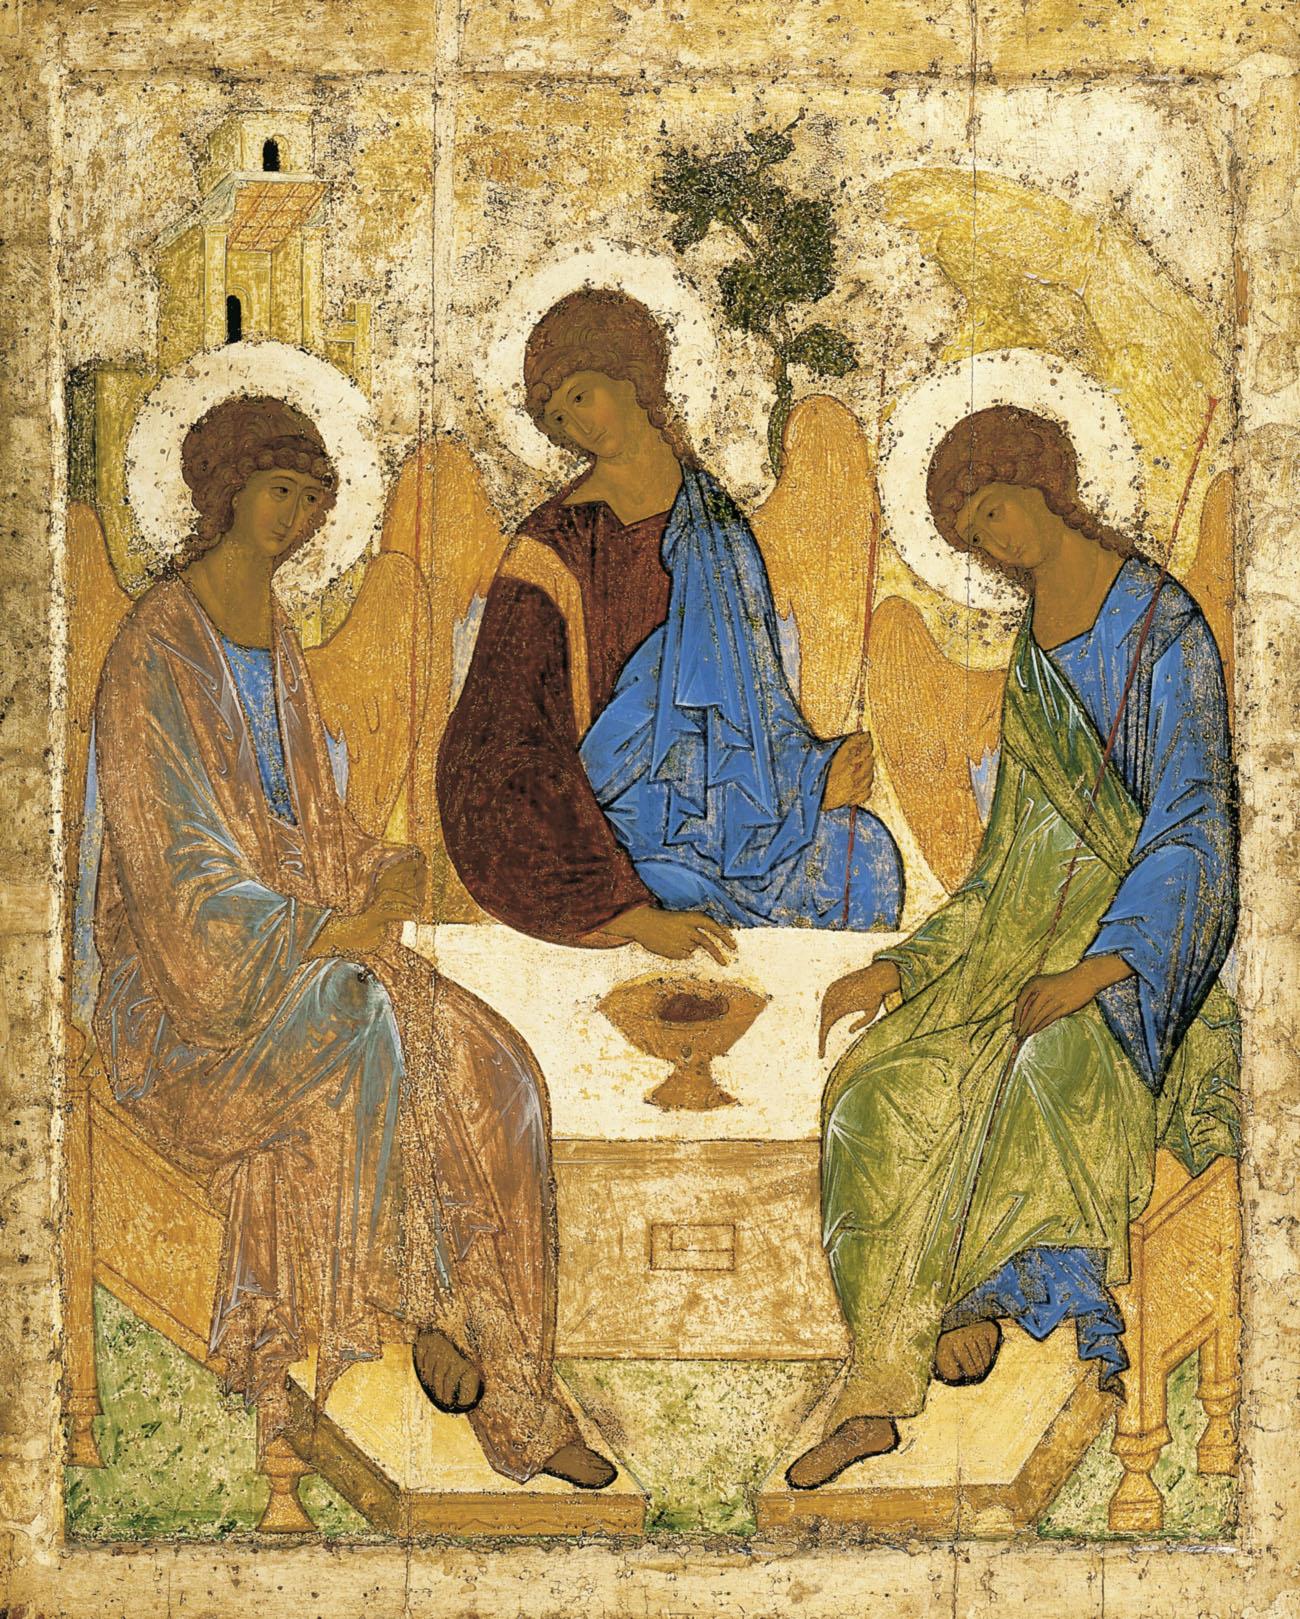 Andrei Rublev's Trinity [c. 1425]